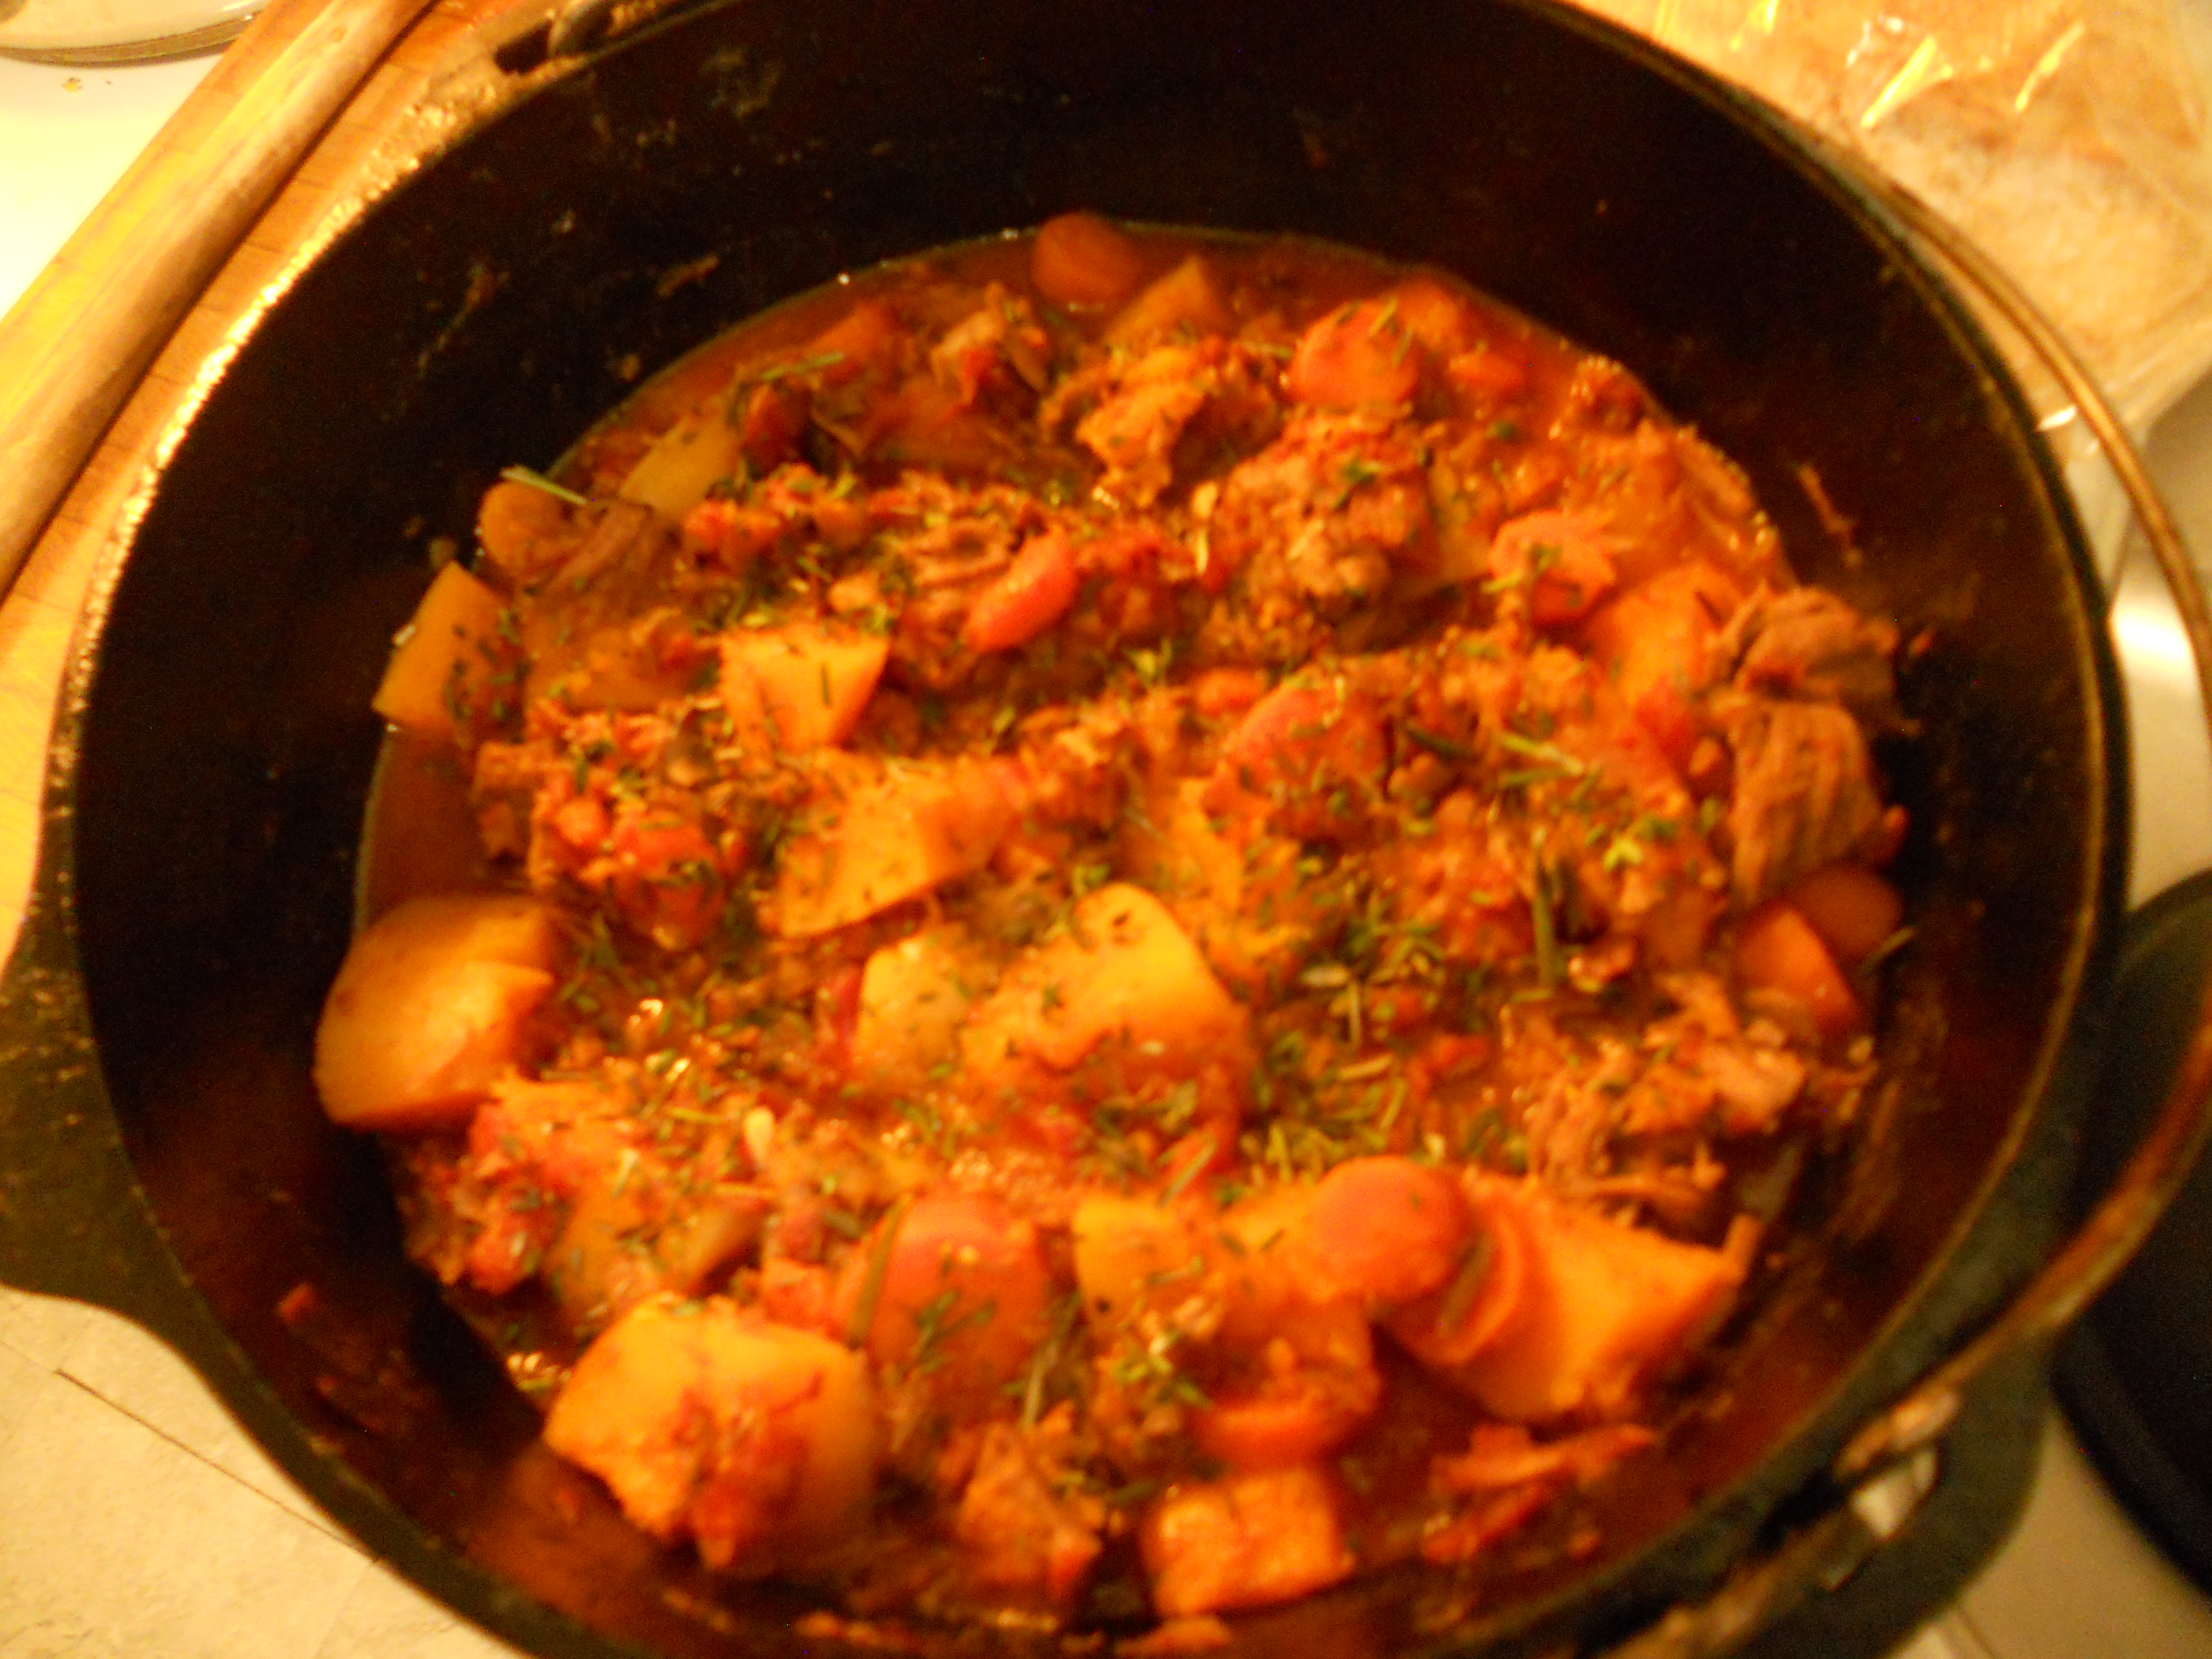 Lamb Stew with Butternut Squash OleChef